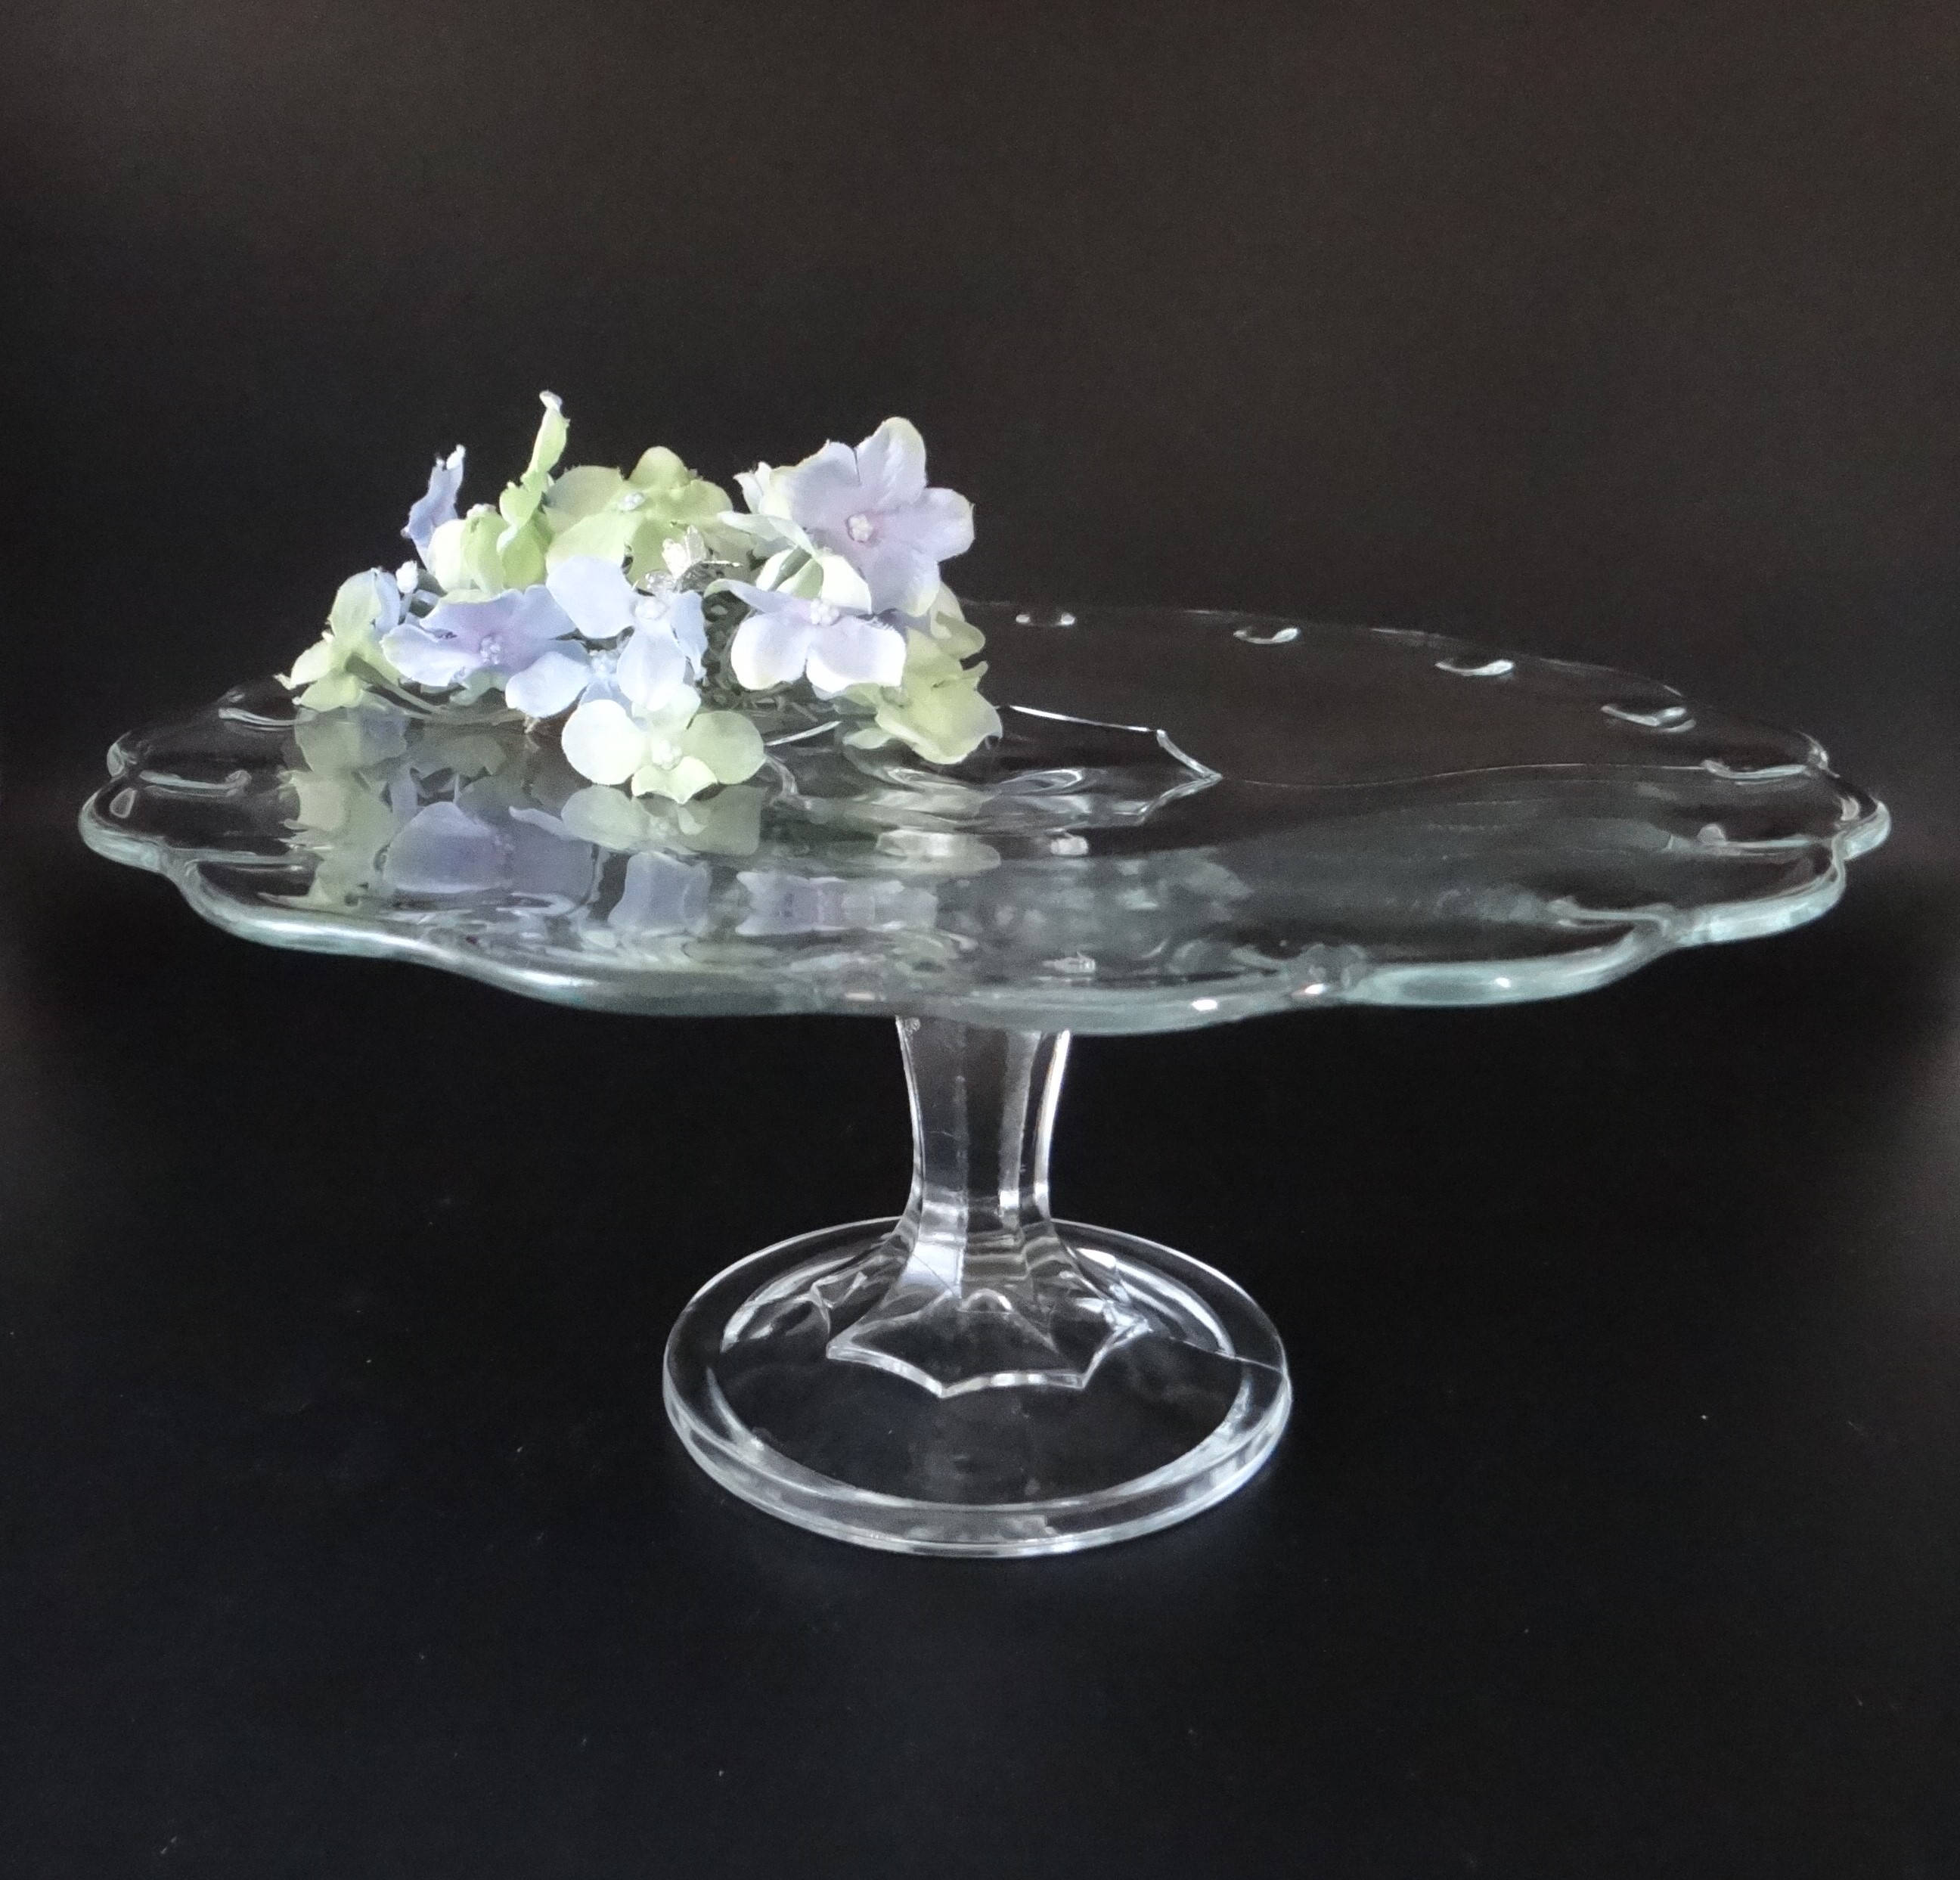 Vintage Indiana Glass Teardrop Round Pedestal Cake Stand ... & Vintage Indiana Glass Teardrop Round Pedestal Cake Stand \u2013 11 ...